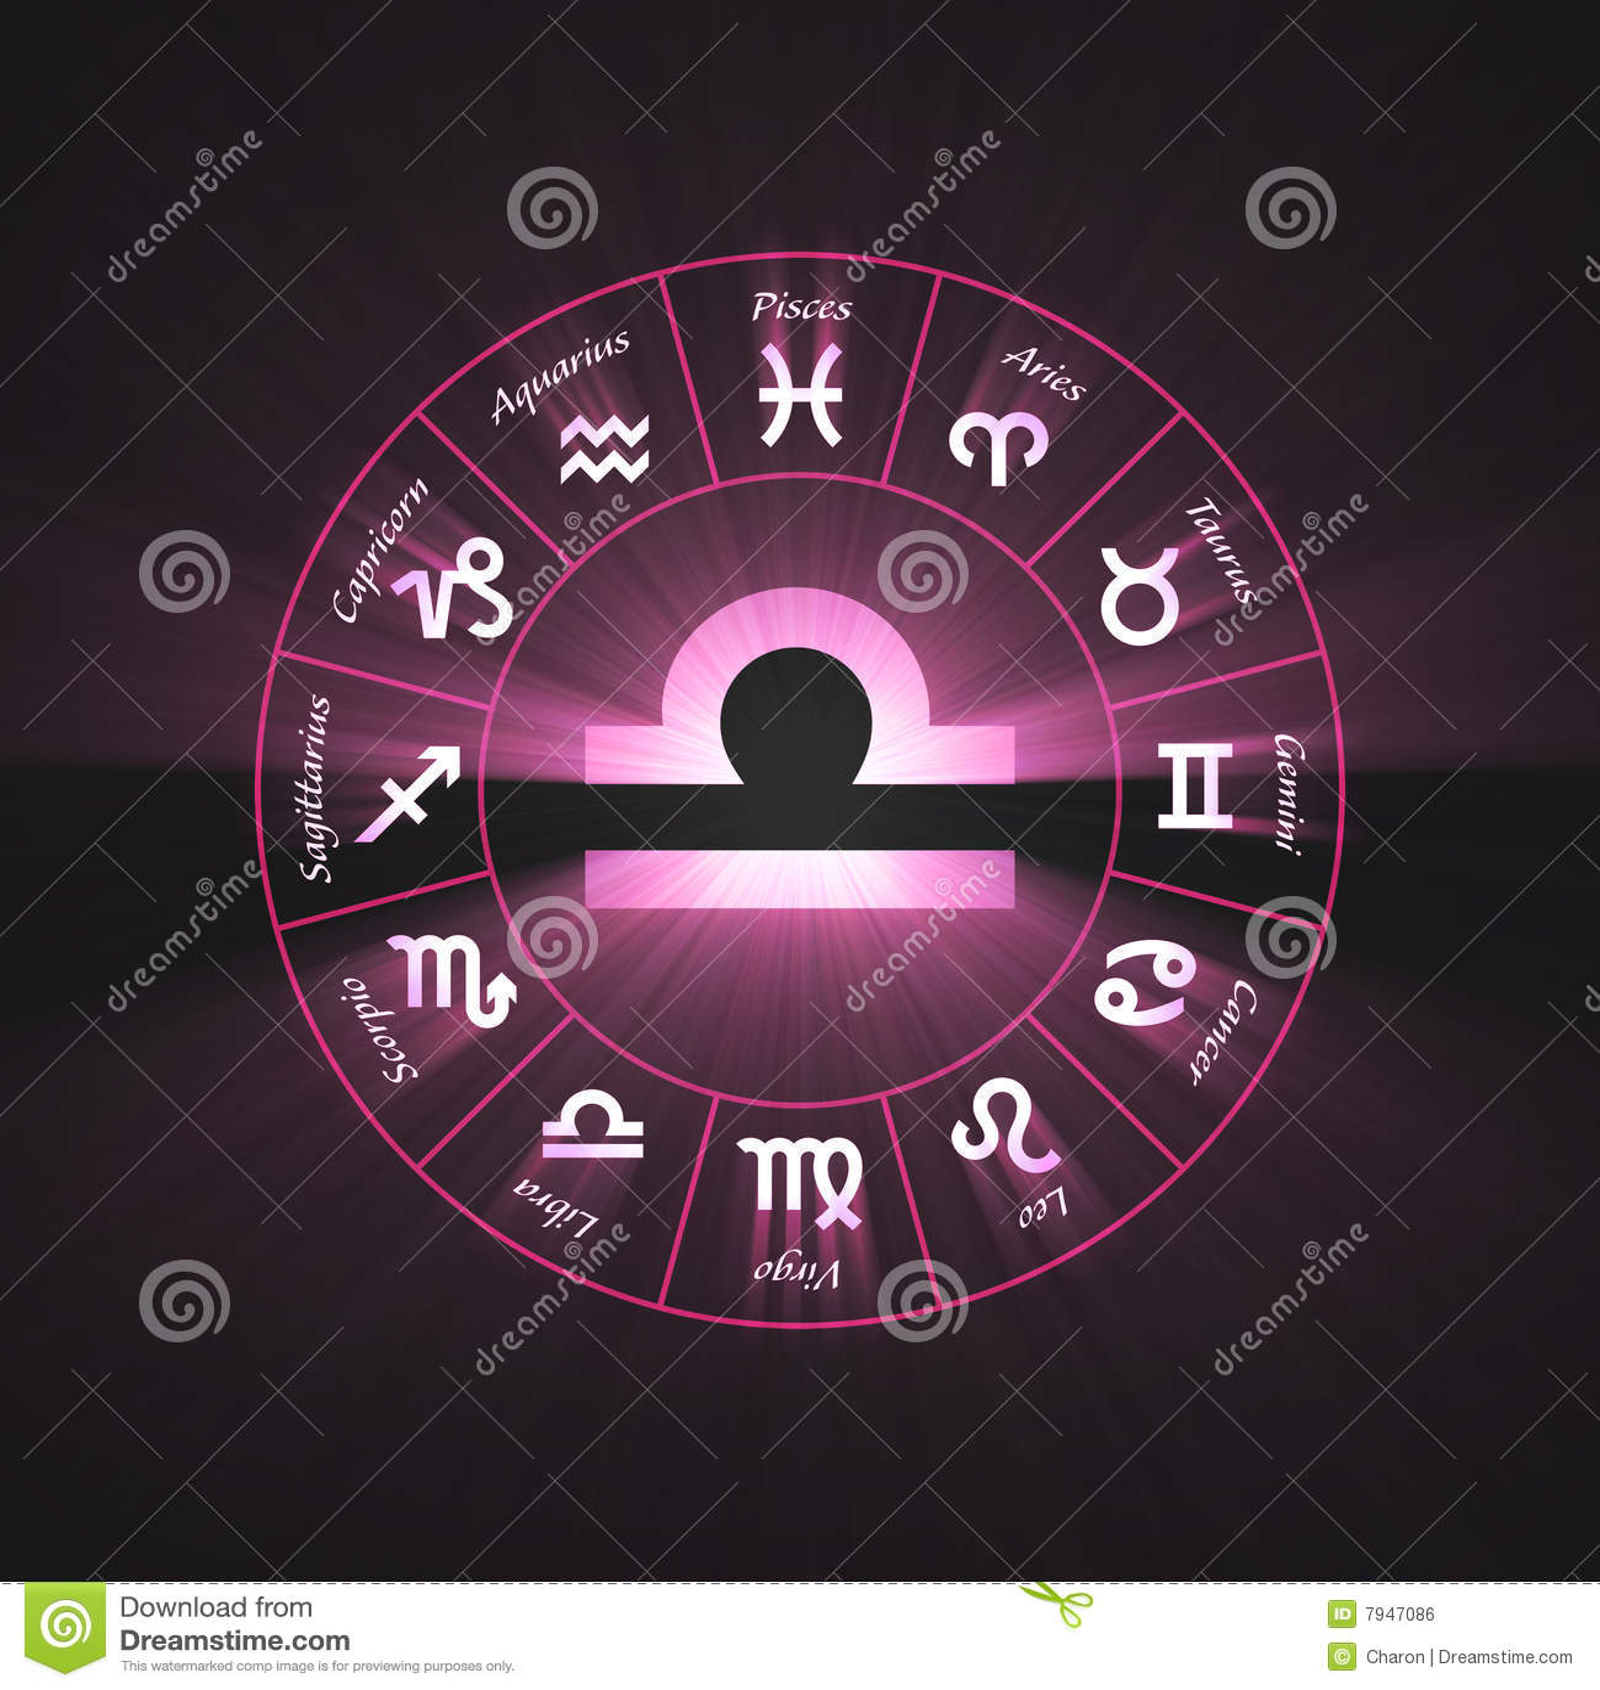 Astrology symbol libra light flare stock illustration astrology symbol libra light flare royalty free stock image biocorpaavc Choice Image